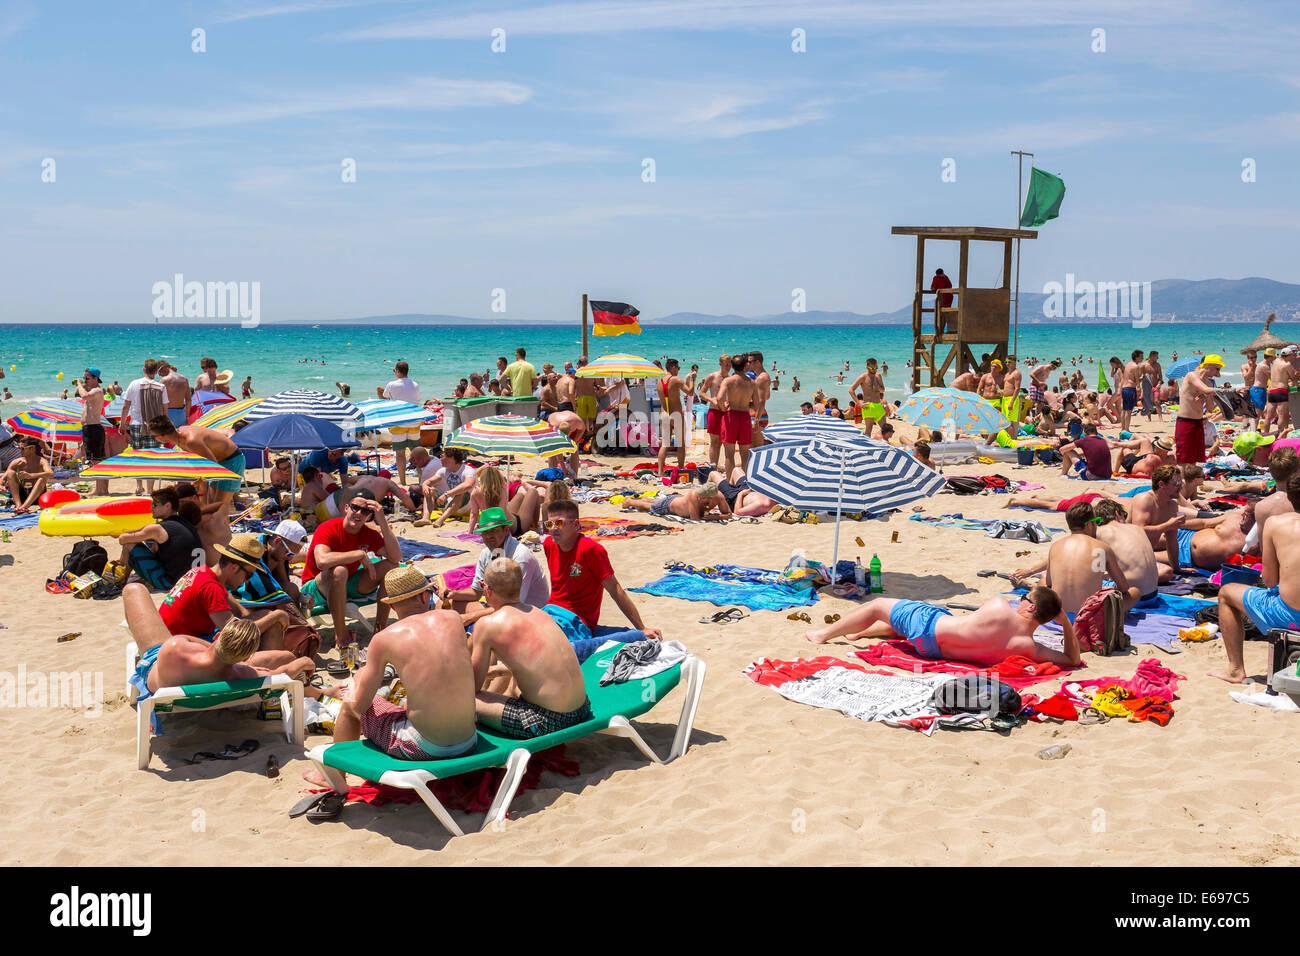 playa de palma bucht